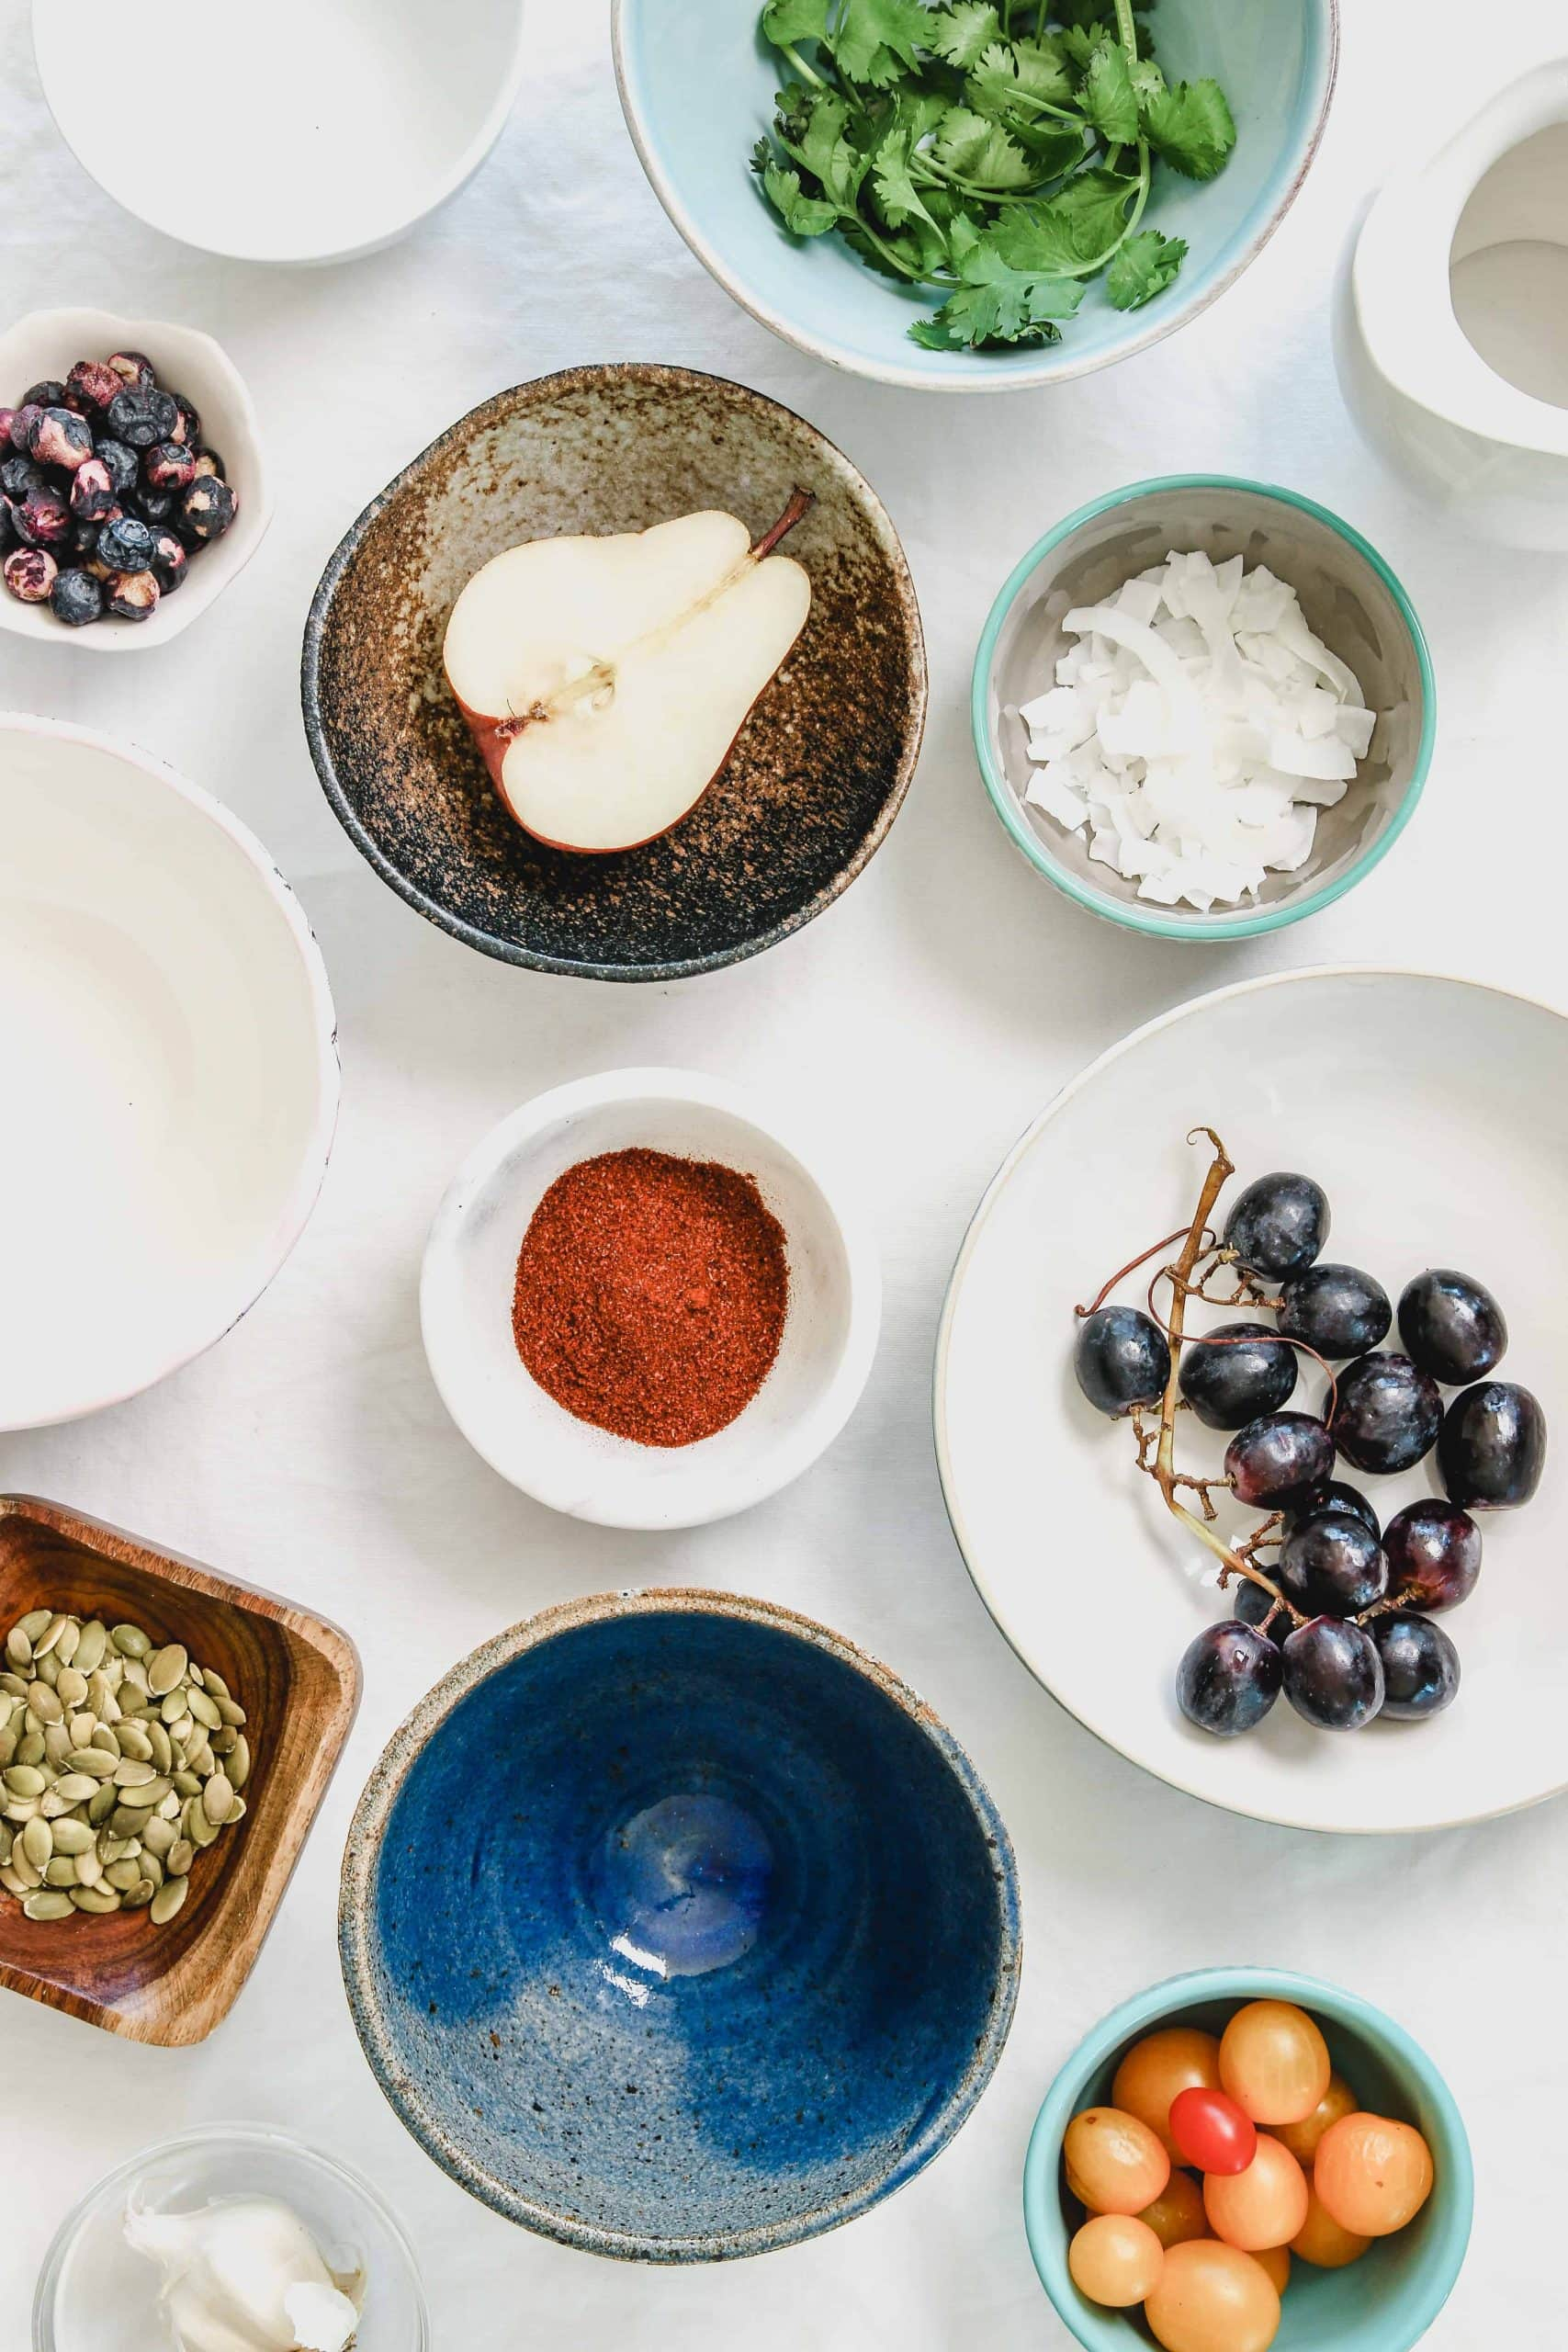 fruit in bowls - healthy food swaps